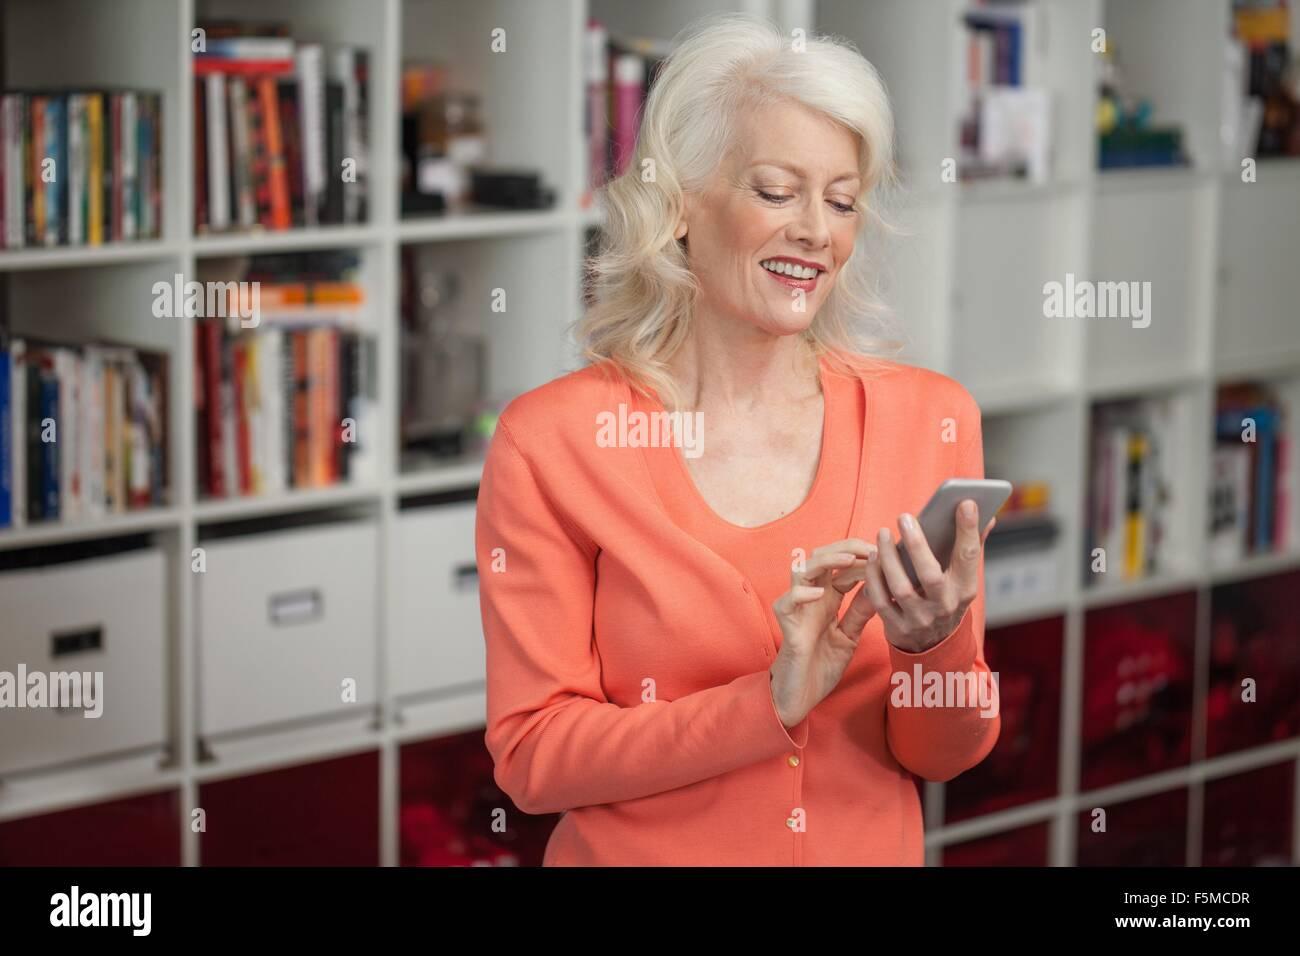 Mature woman using smartphone, indoors - Stock Image